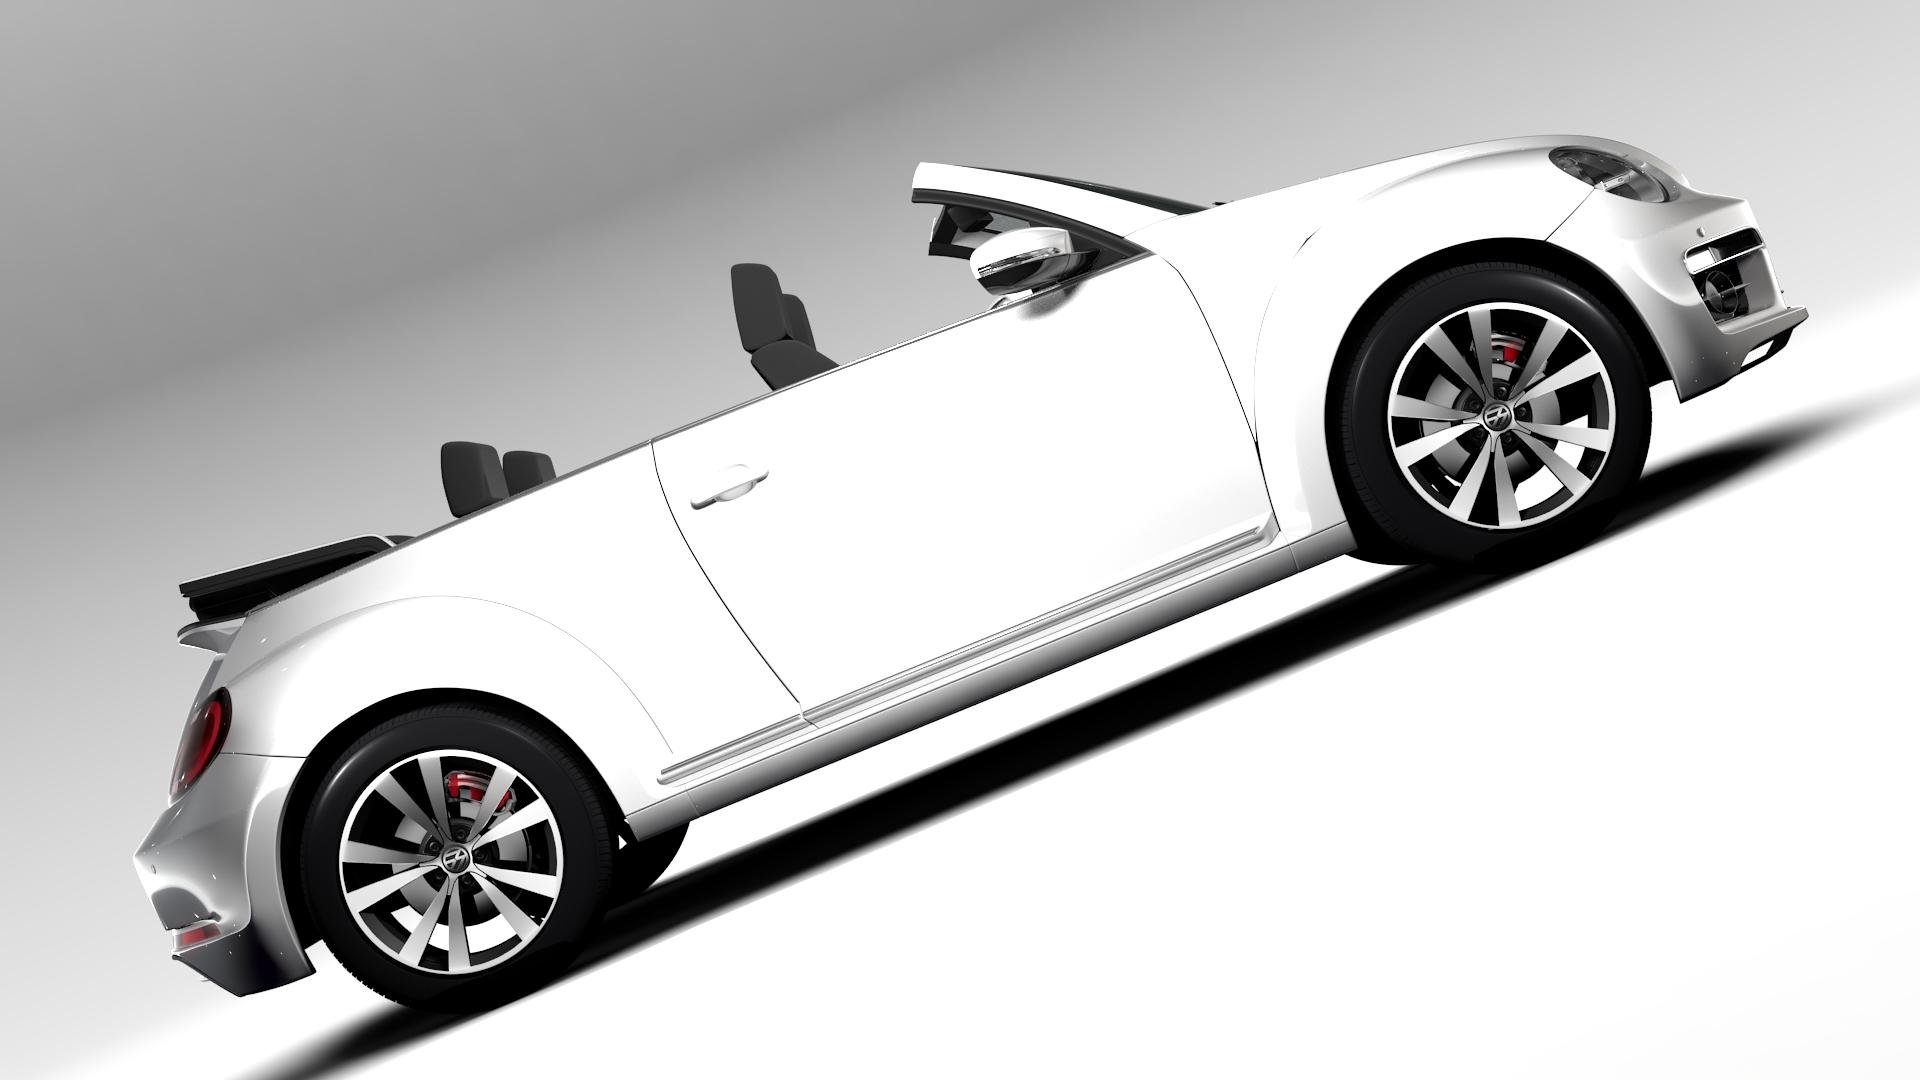 vw beetle cabriolet 2017 3d model 3ds max fbx c4d lwo ma mb hrc xsi obj 221596